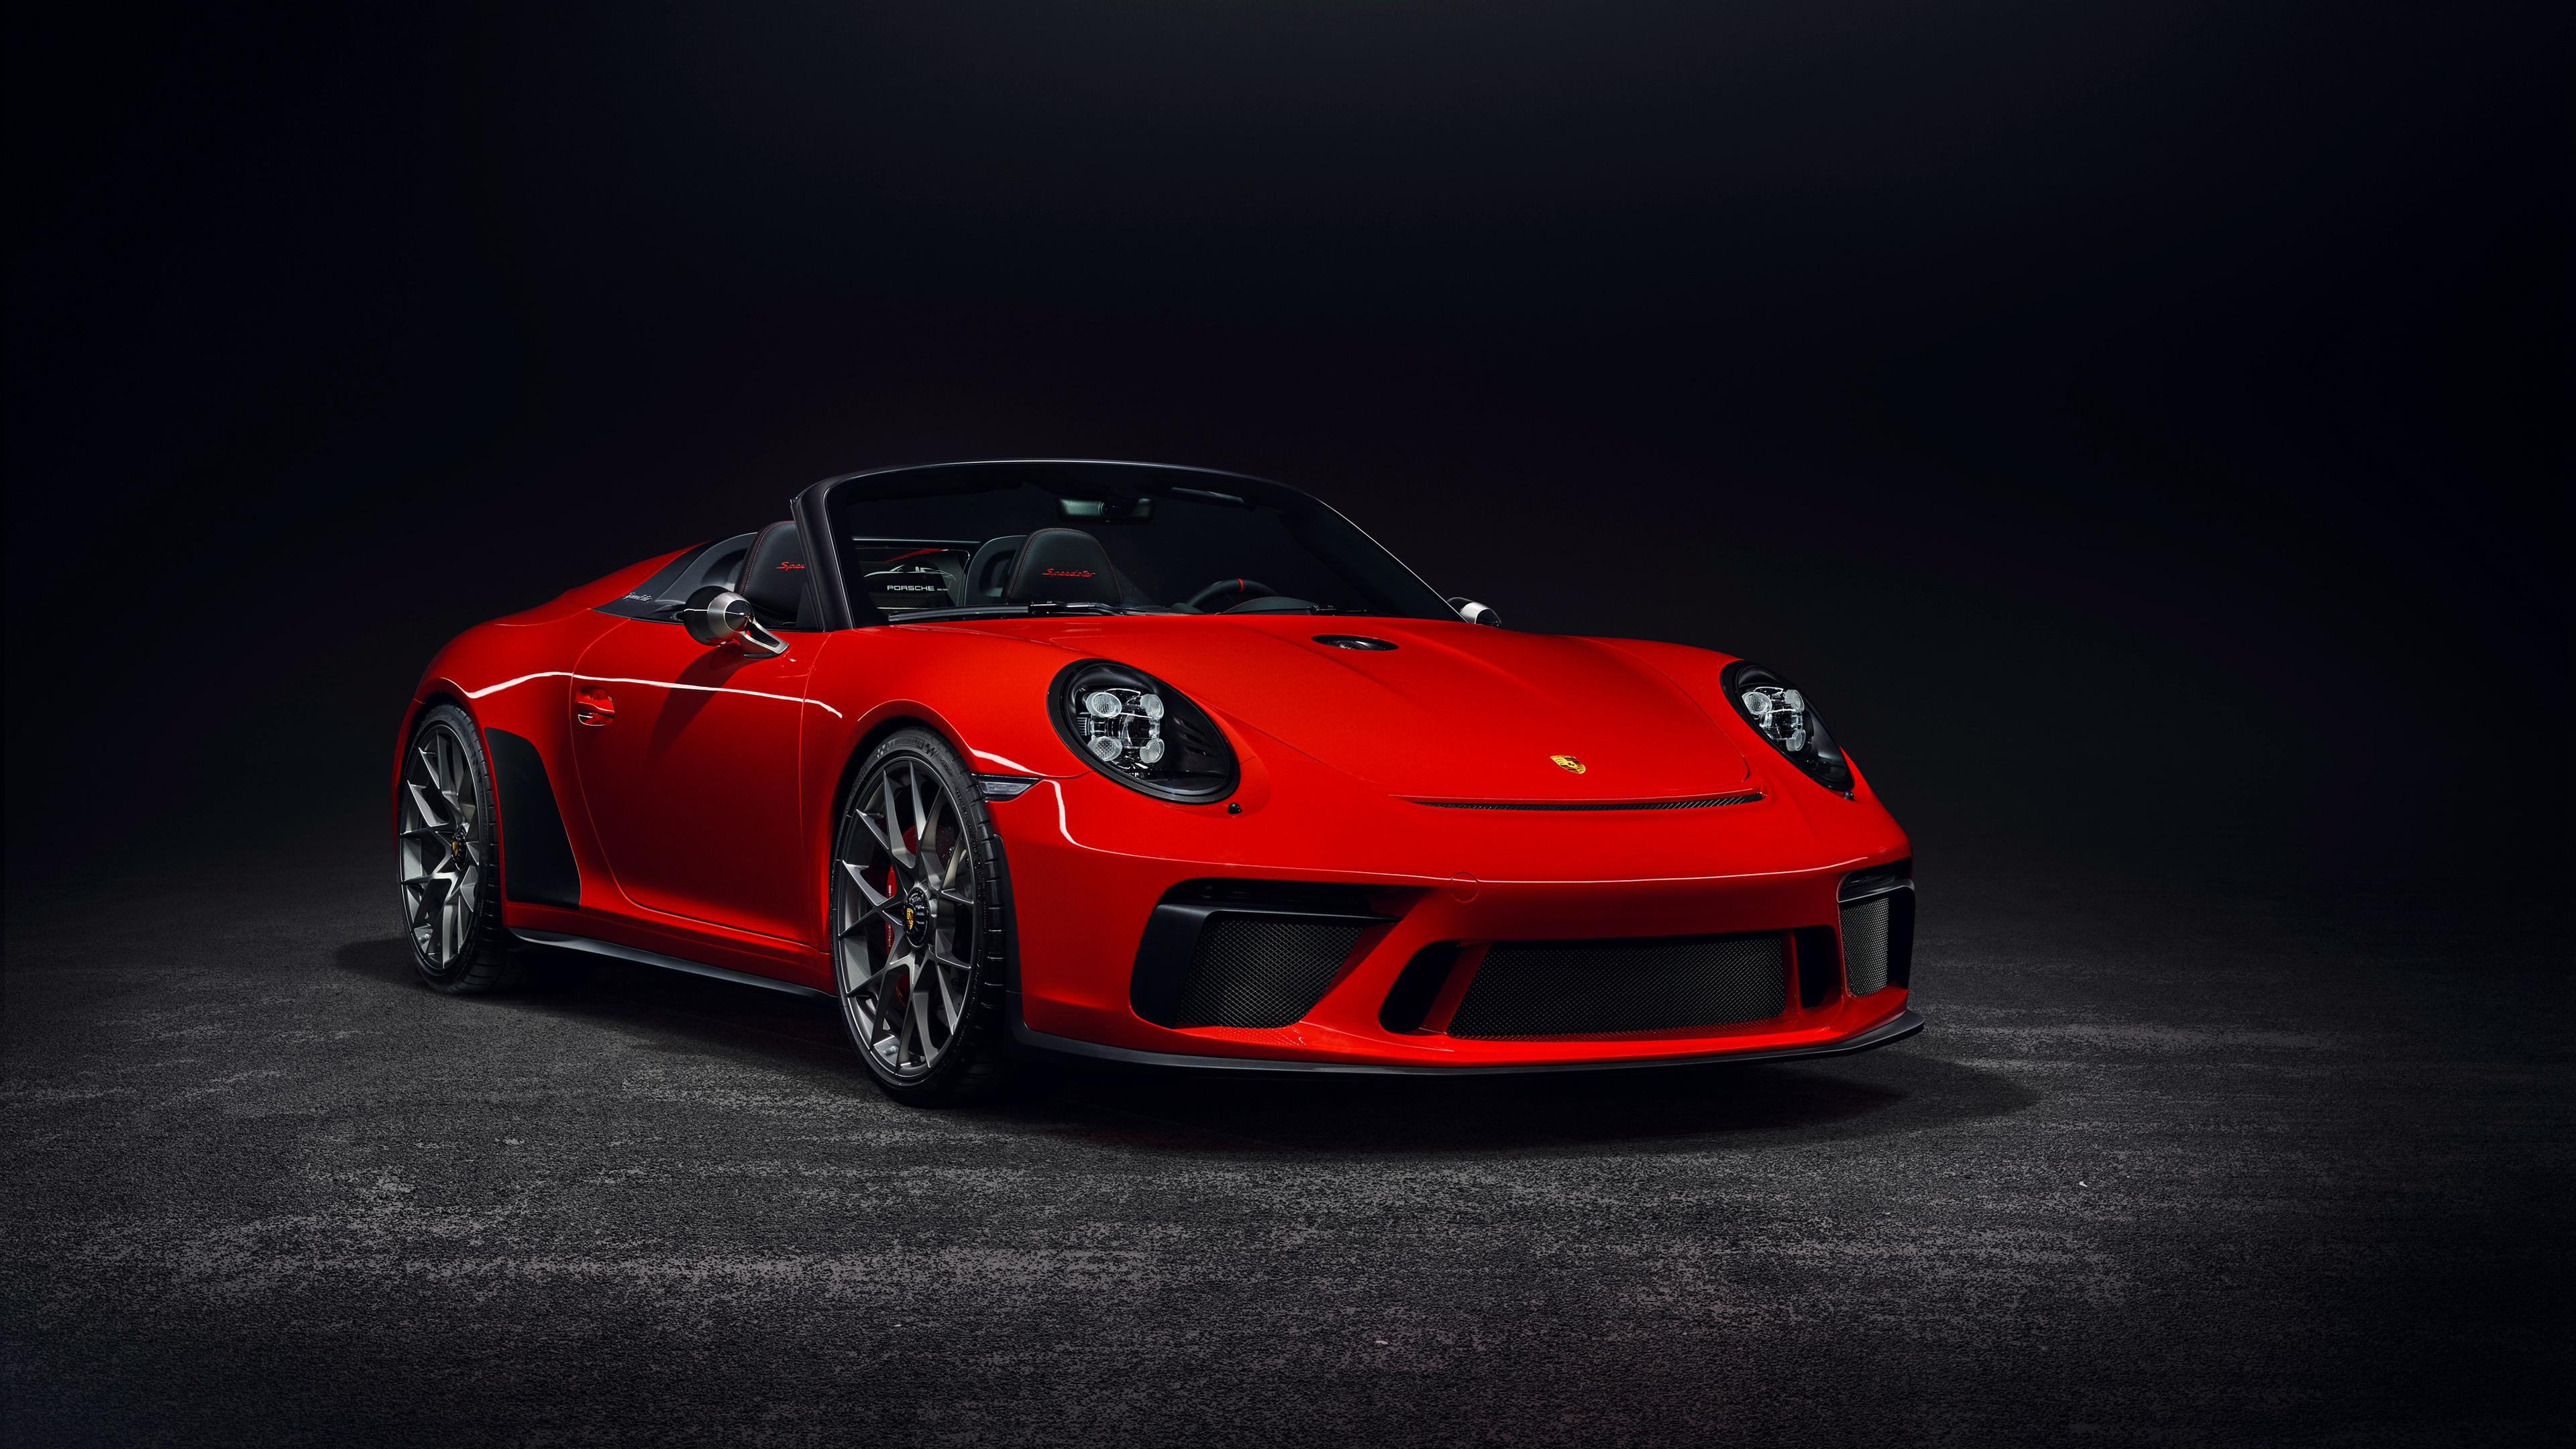 porsche 911 speedster concept ii 2018 1539792823 - Porsche 911 Speedster Concept II 2018 - porsche wallpapers, porsche 911 wallpapers, hd-wallpapers, cars wallpapers, 4k-wallpapers, 2018 cars wallpapers